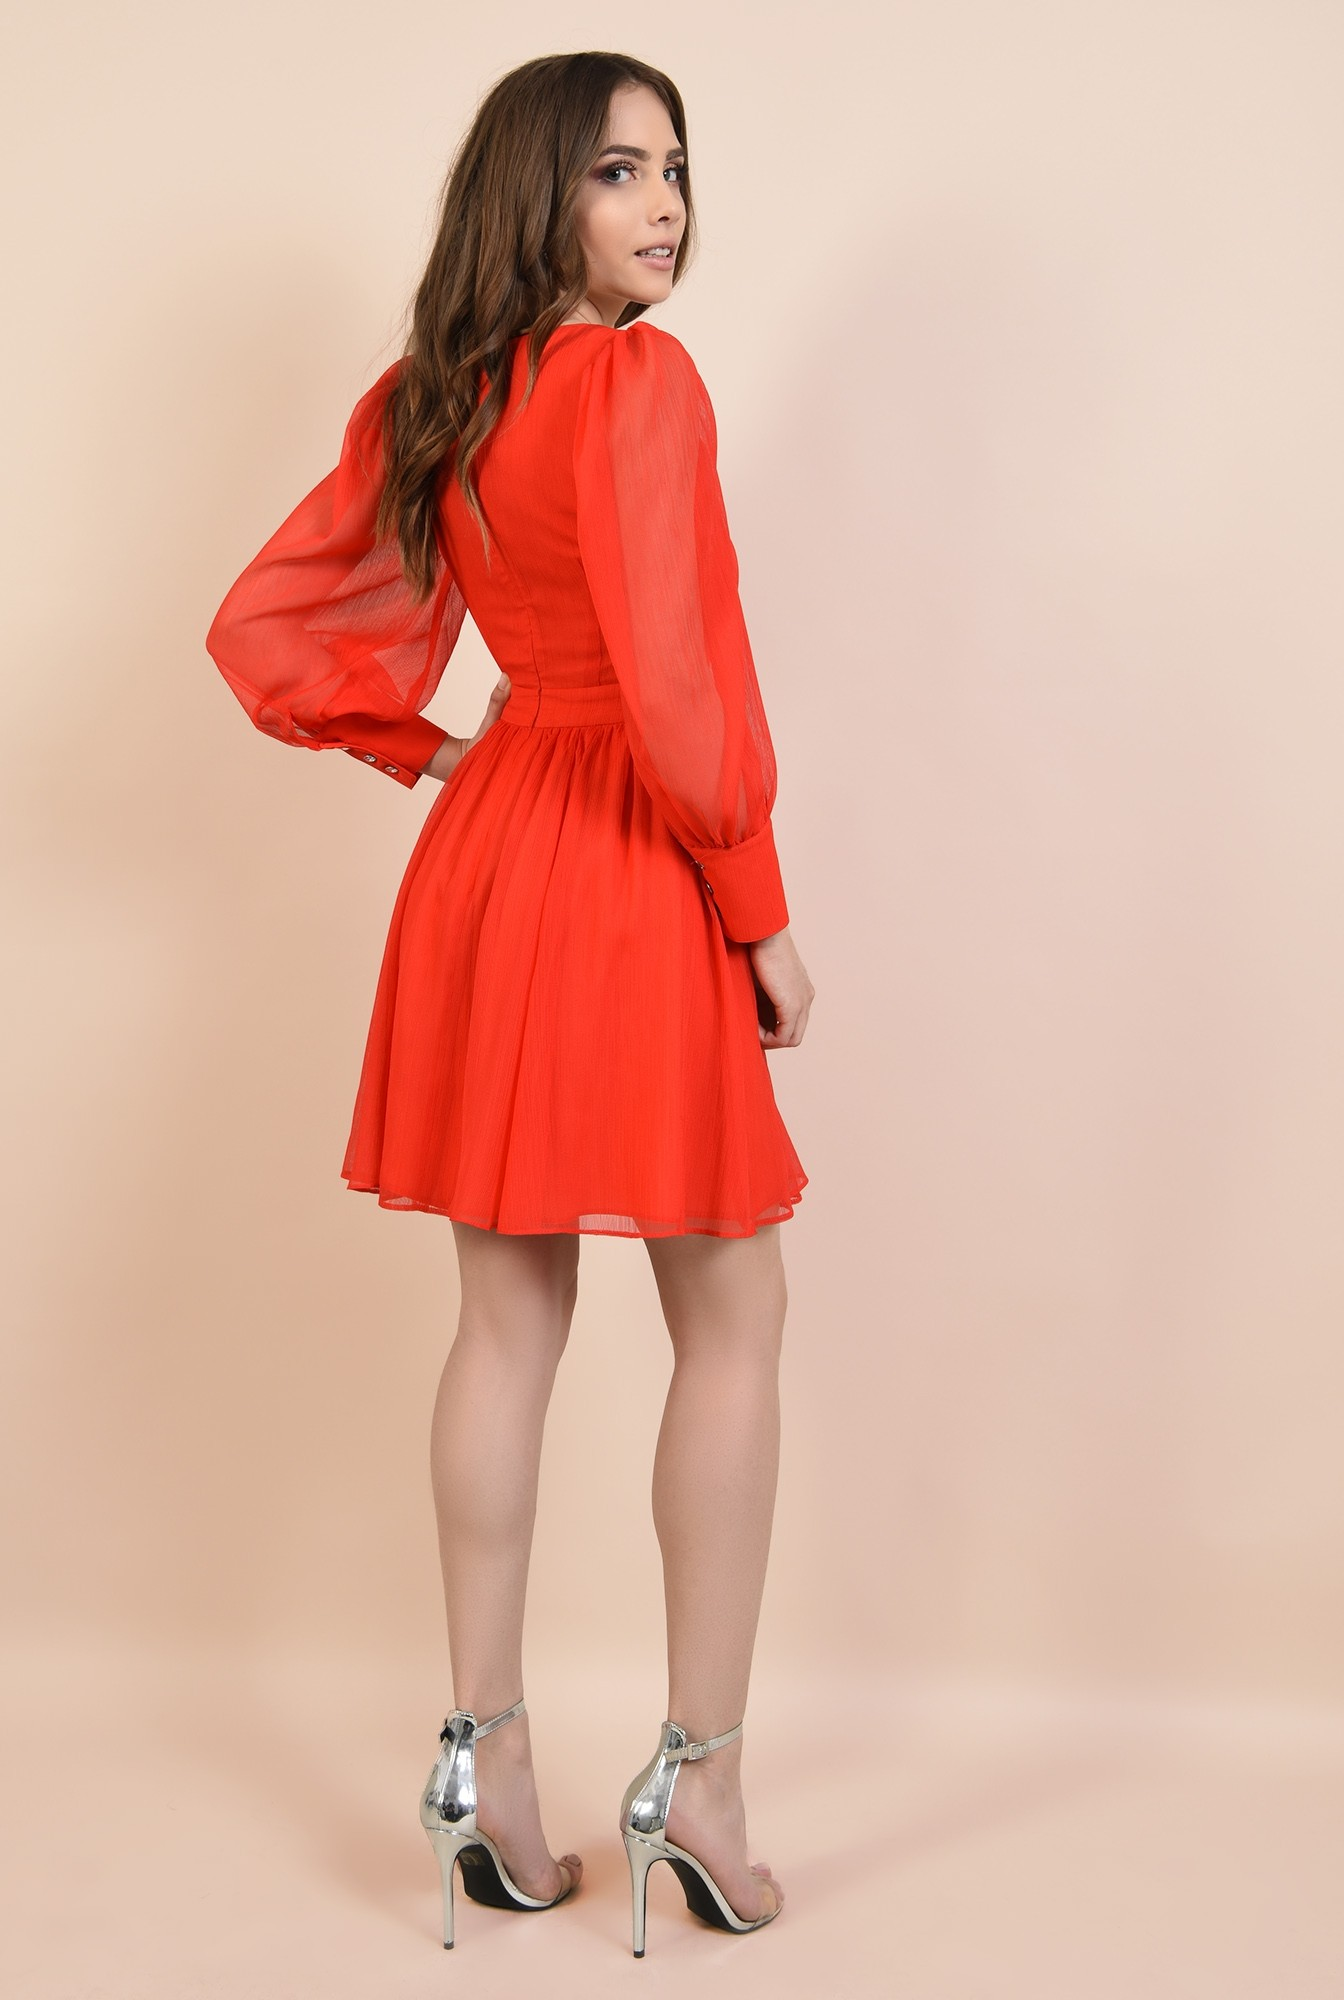 1 - rochie de ocazie, din voal creponat, rosu, cu bust fronsat, croi evazat